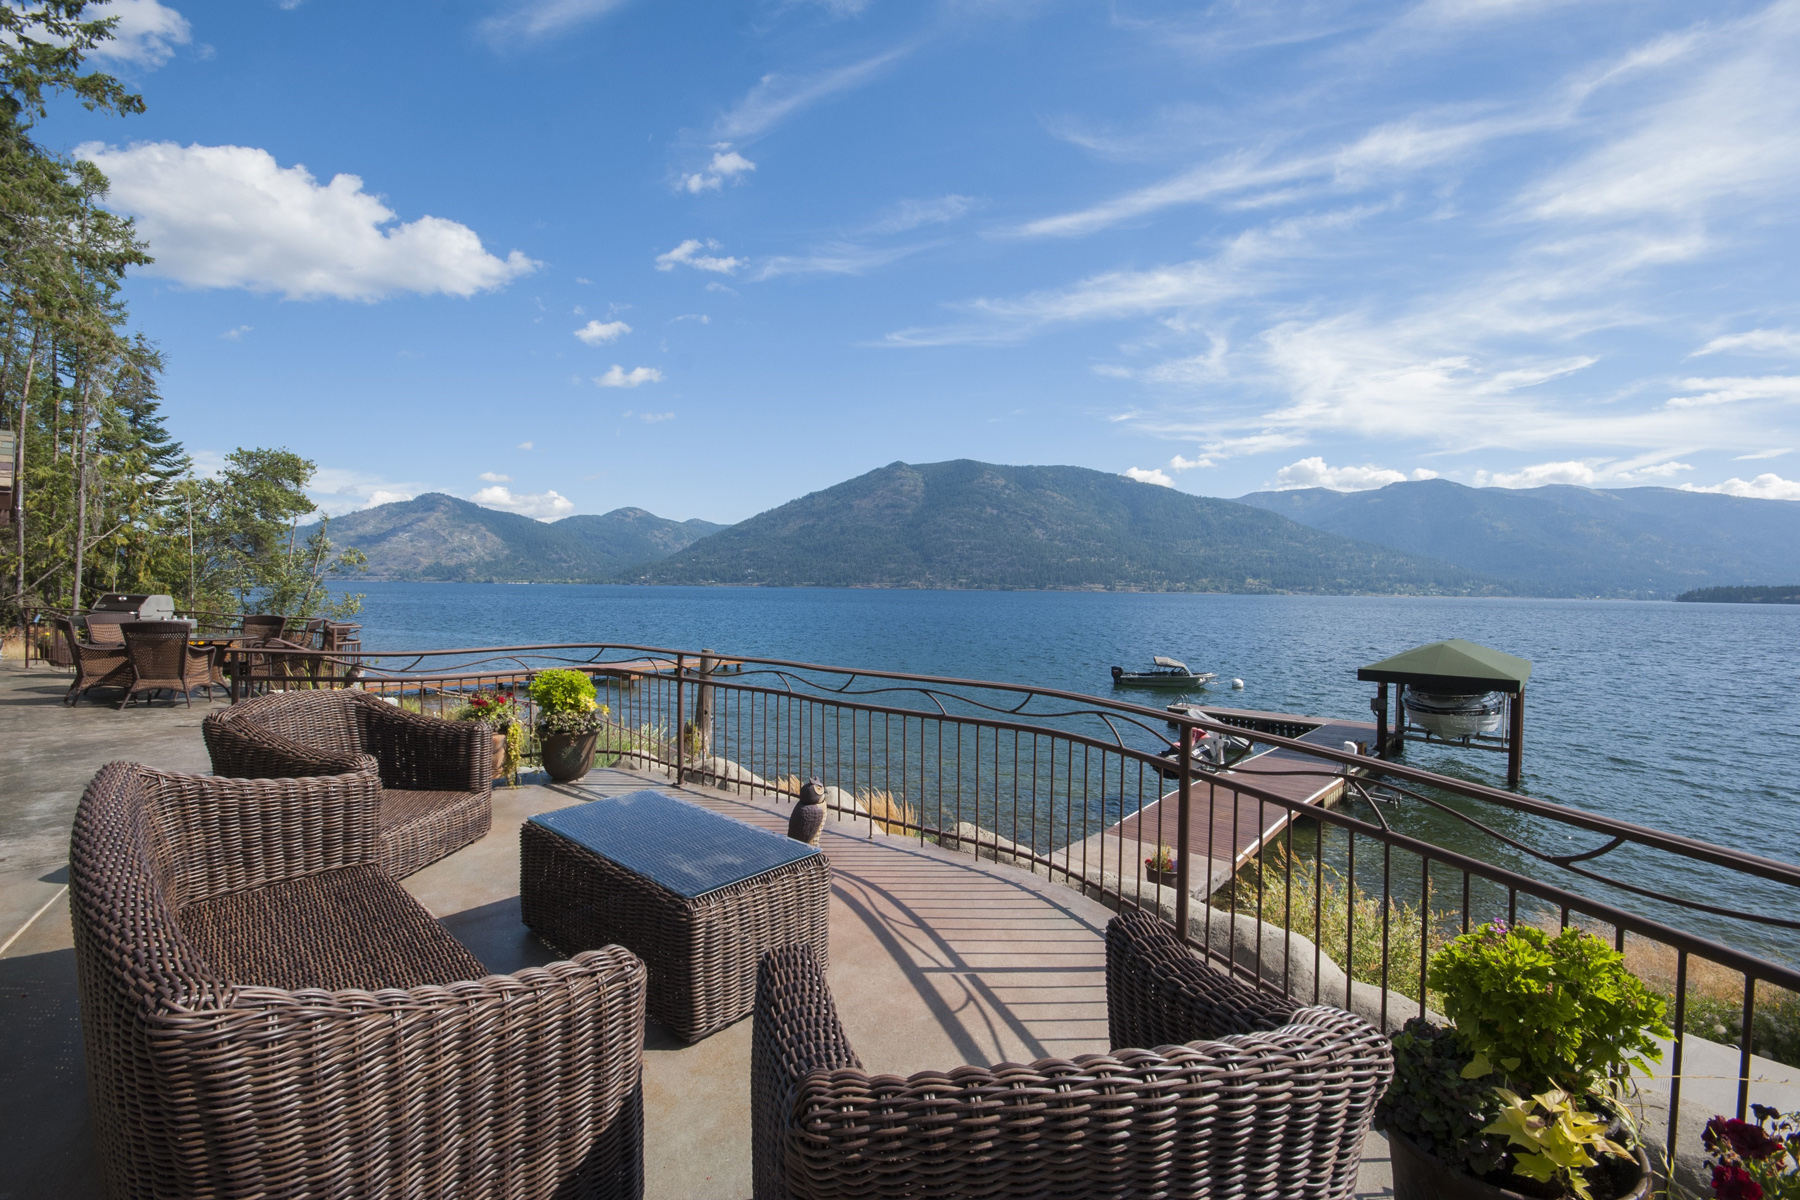 Single Family Home for Sale at Sunrise Bay Luxury Waterfront 609 Sunrise Bay Rd Sagle, Idaho 83860 United States